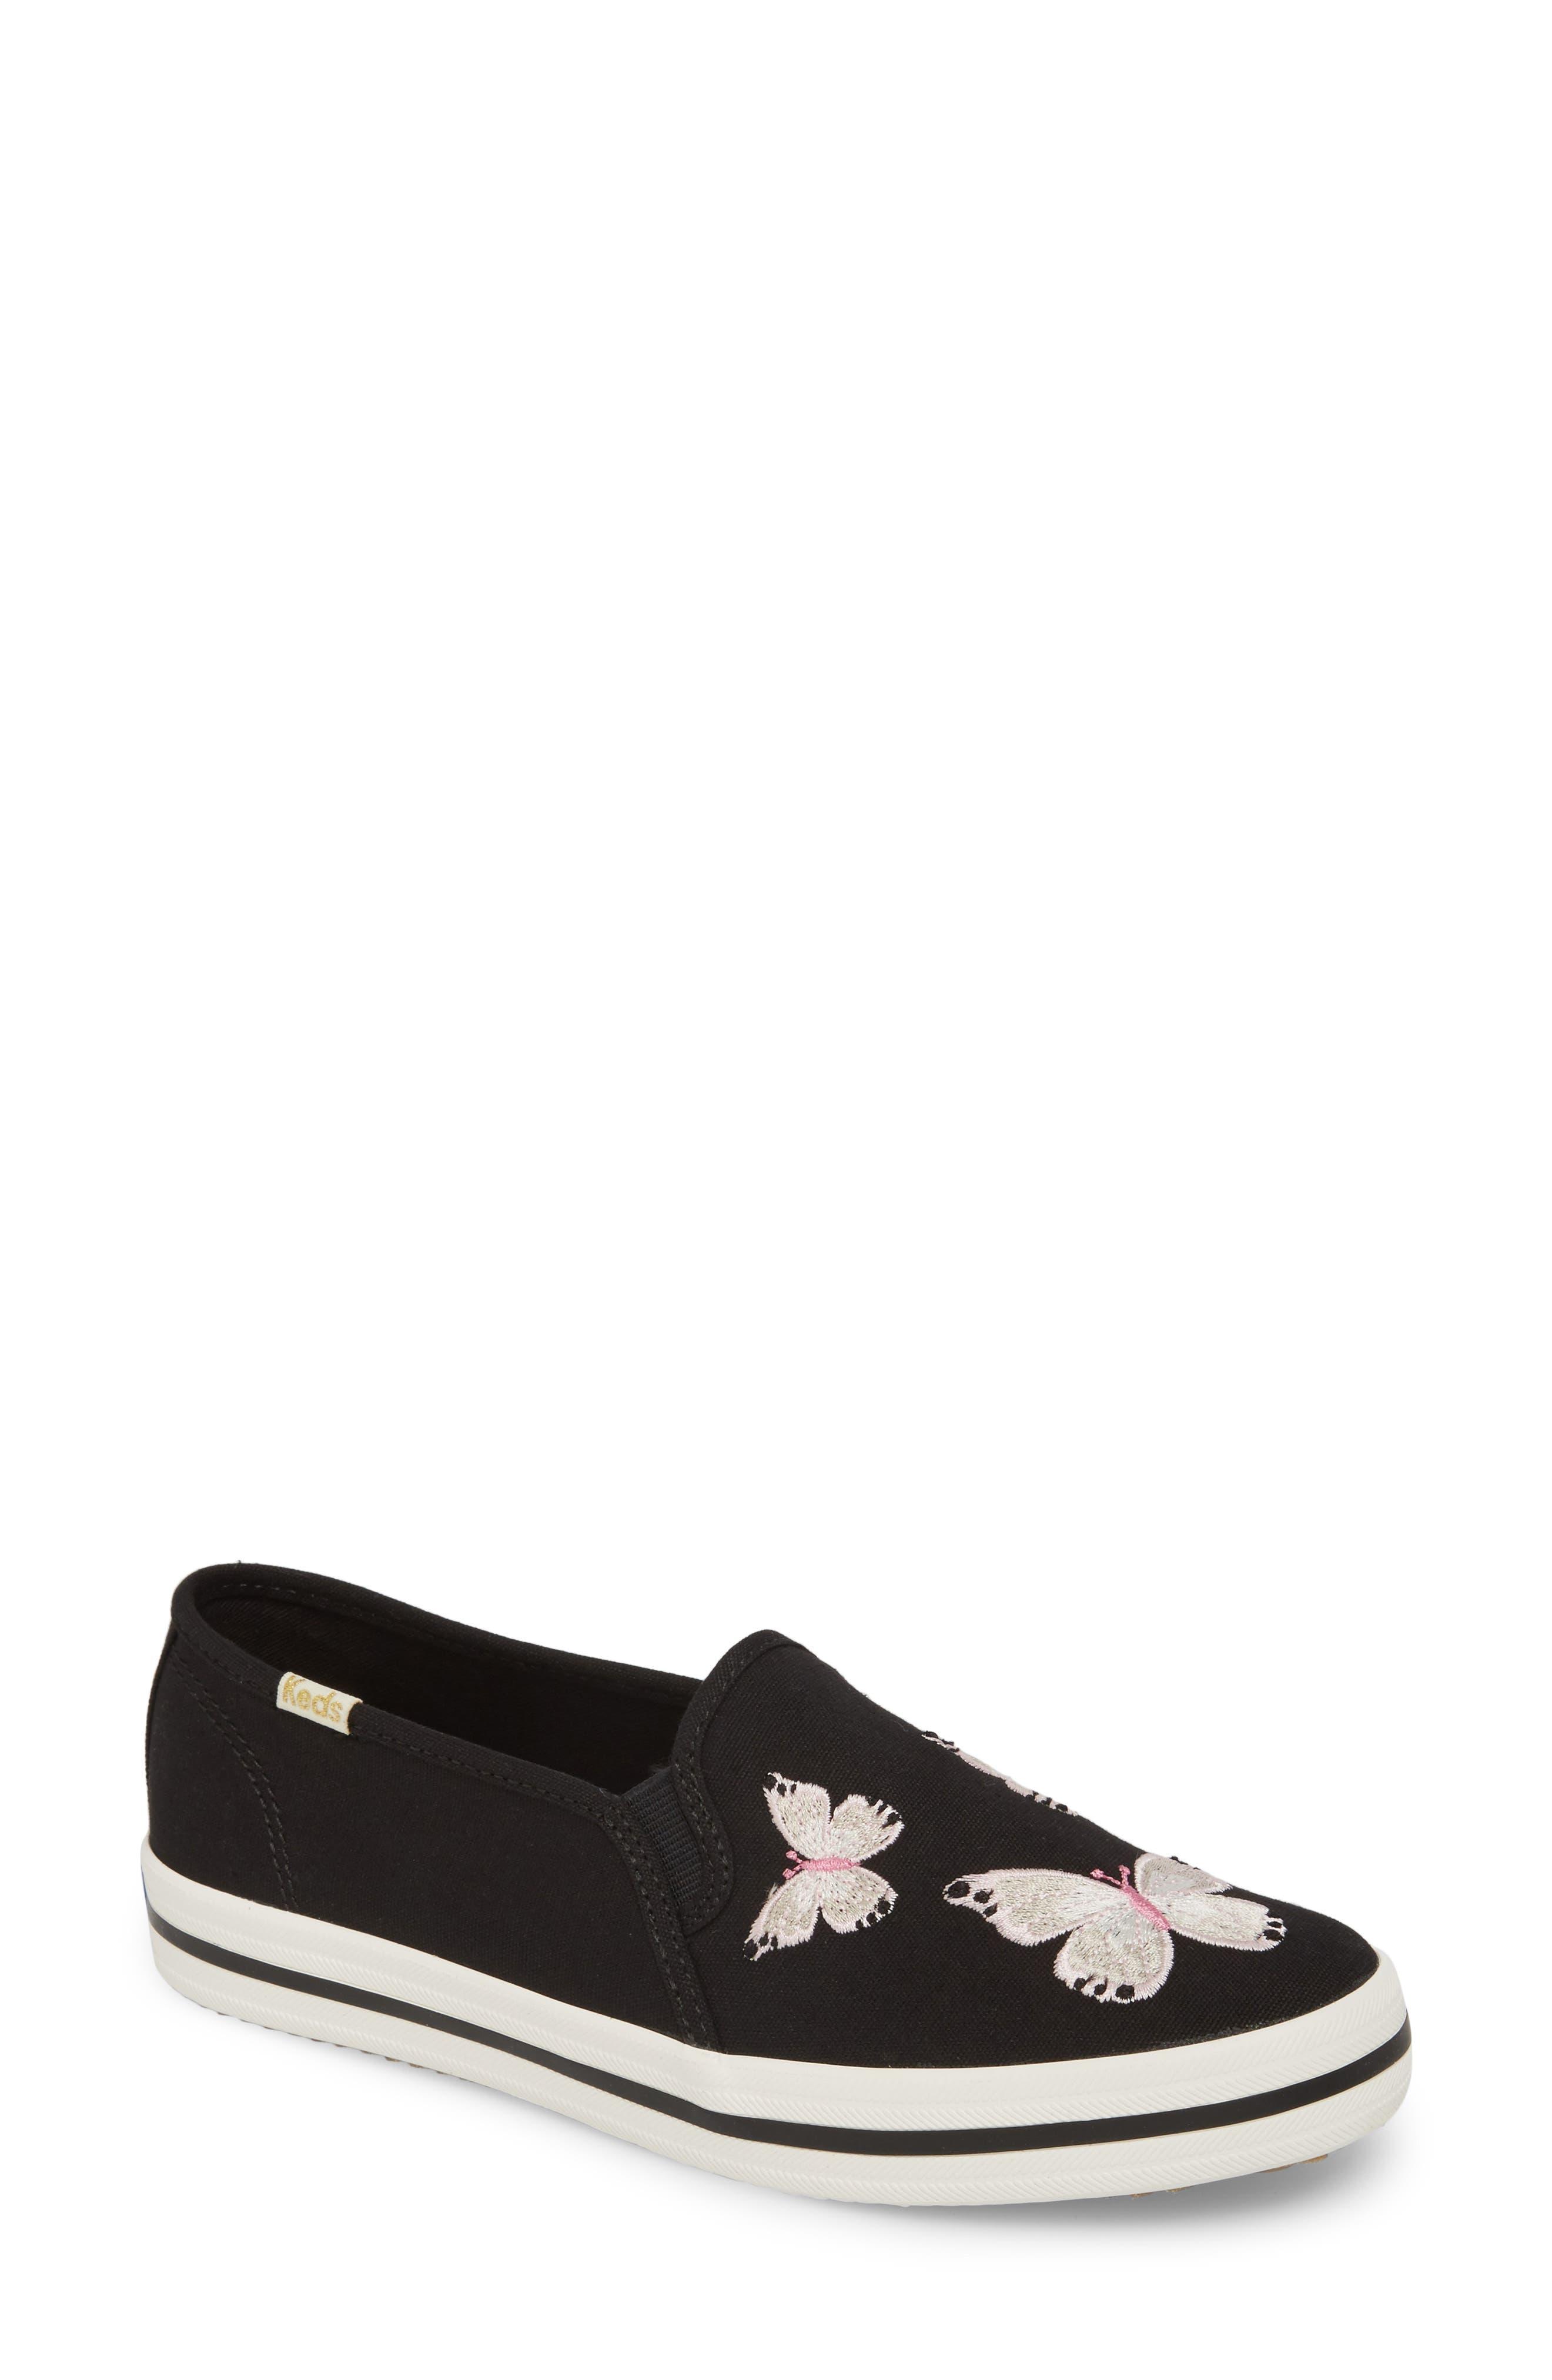 Keds® for kate spade new york butterfly double decker slip-on sneaker (Women)